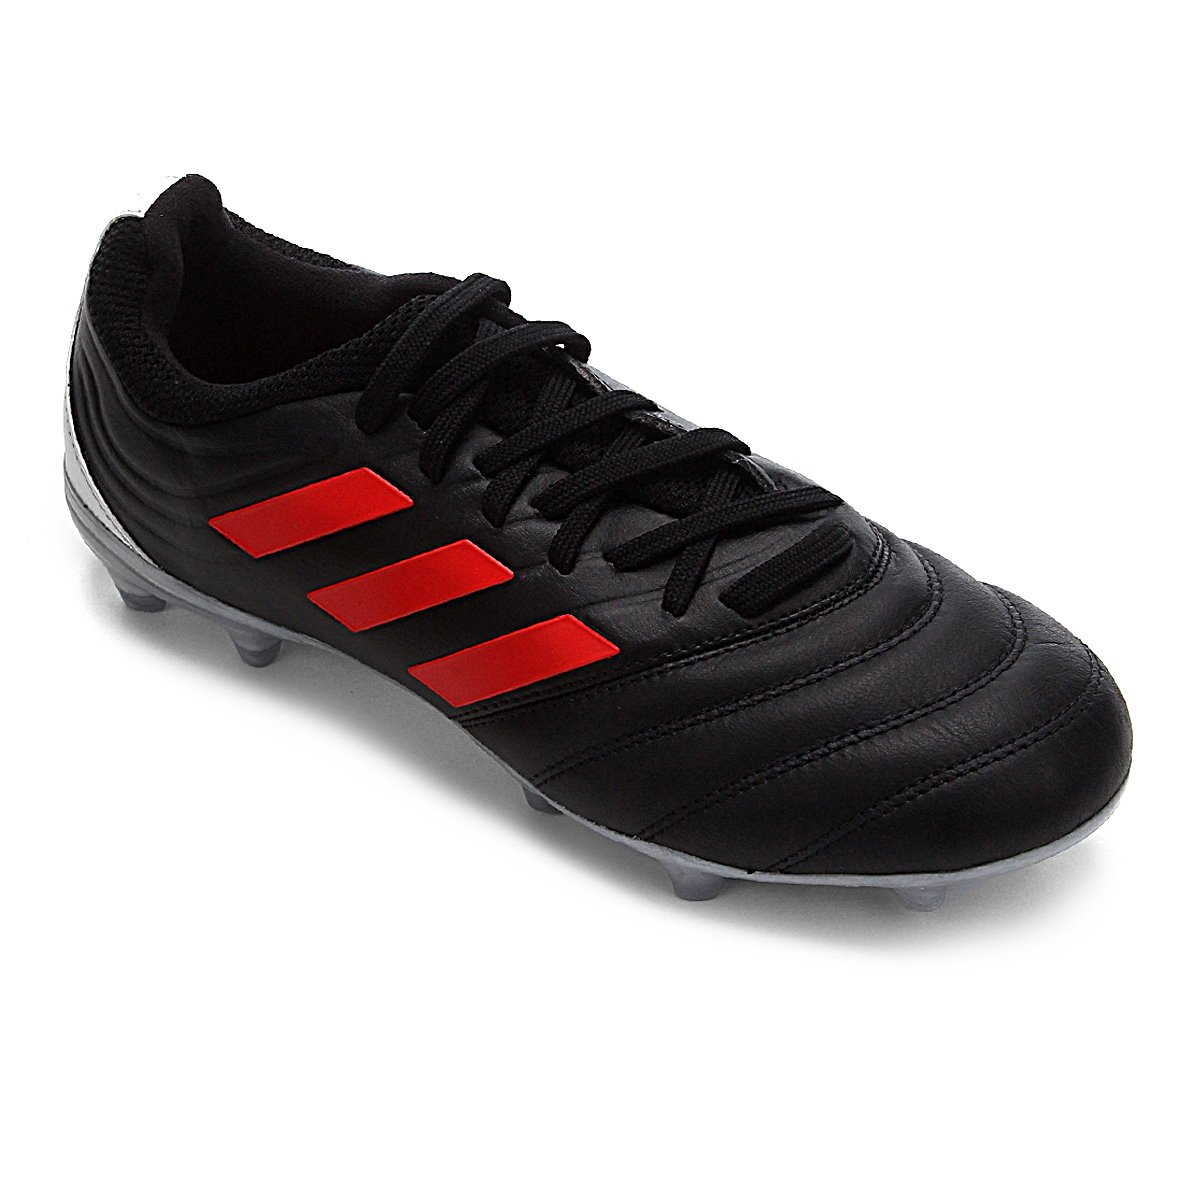 Chuteira Campo Adidas Copa 19 3 FG Preto